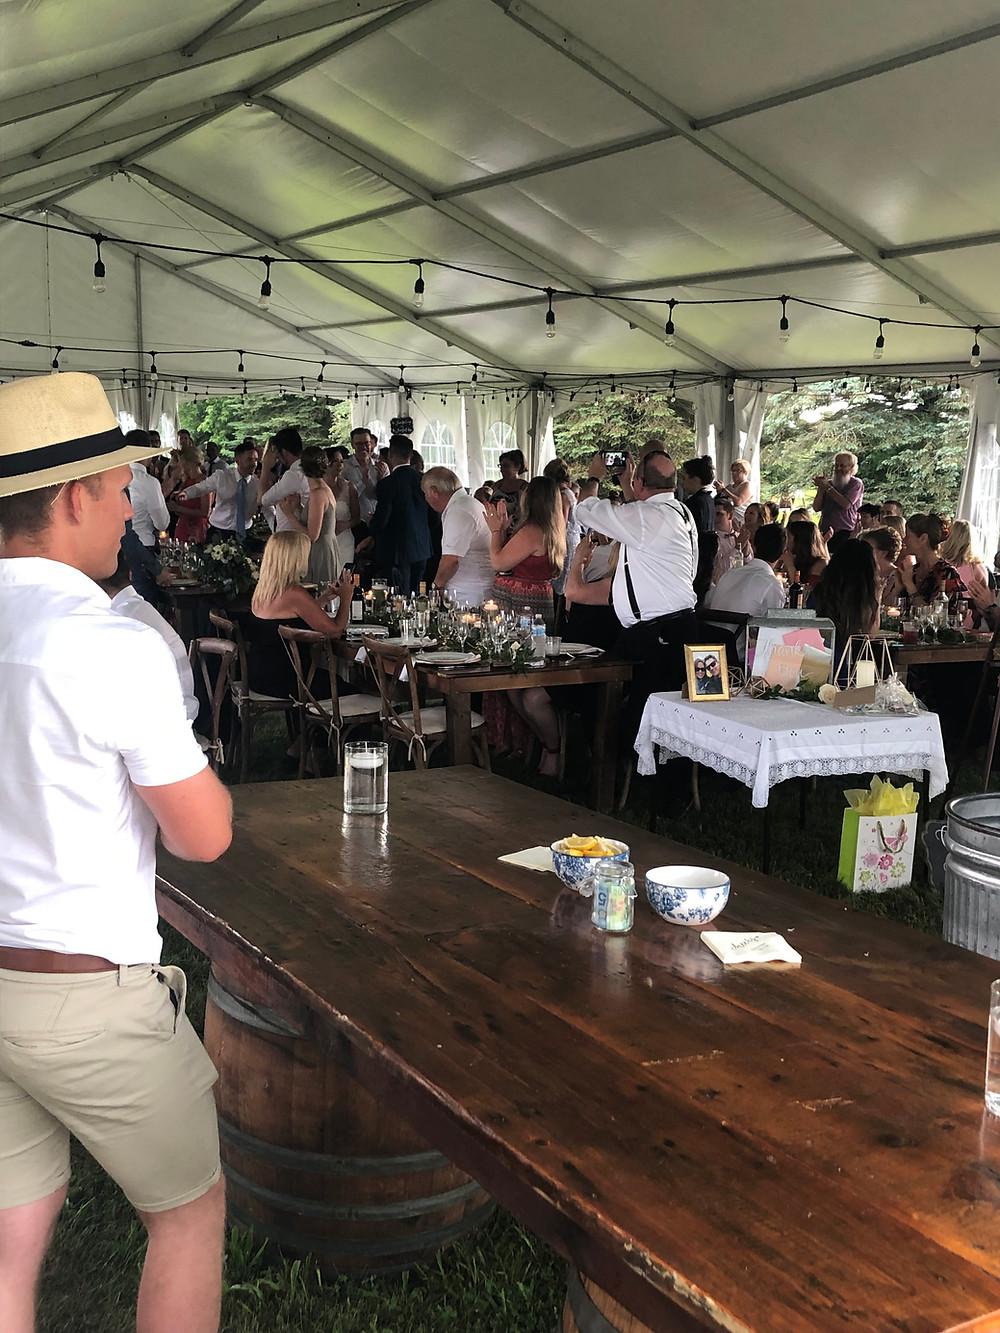 Bartender overlooks wedding reception in Ontario